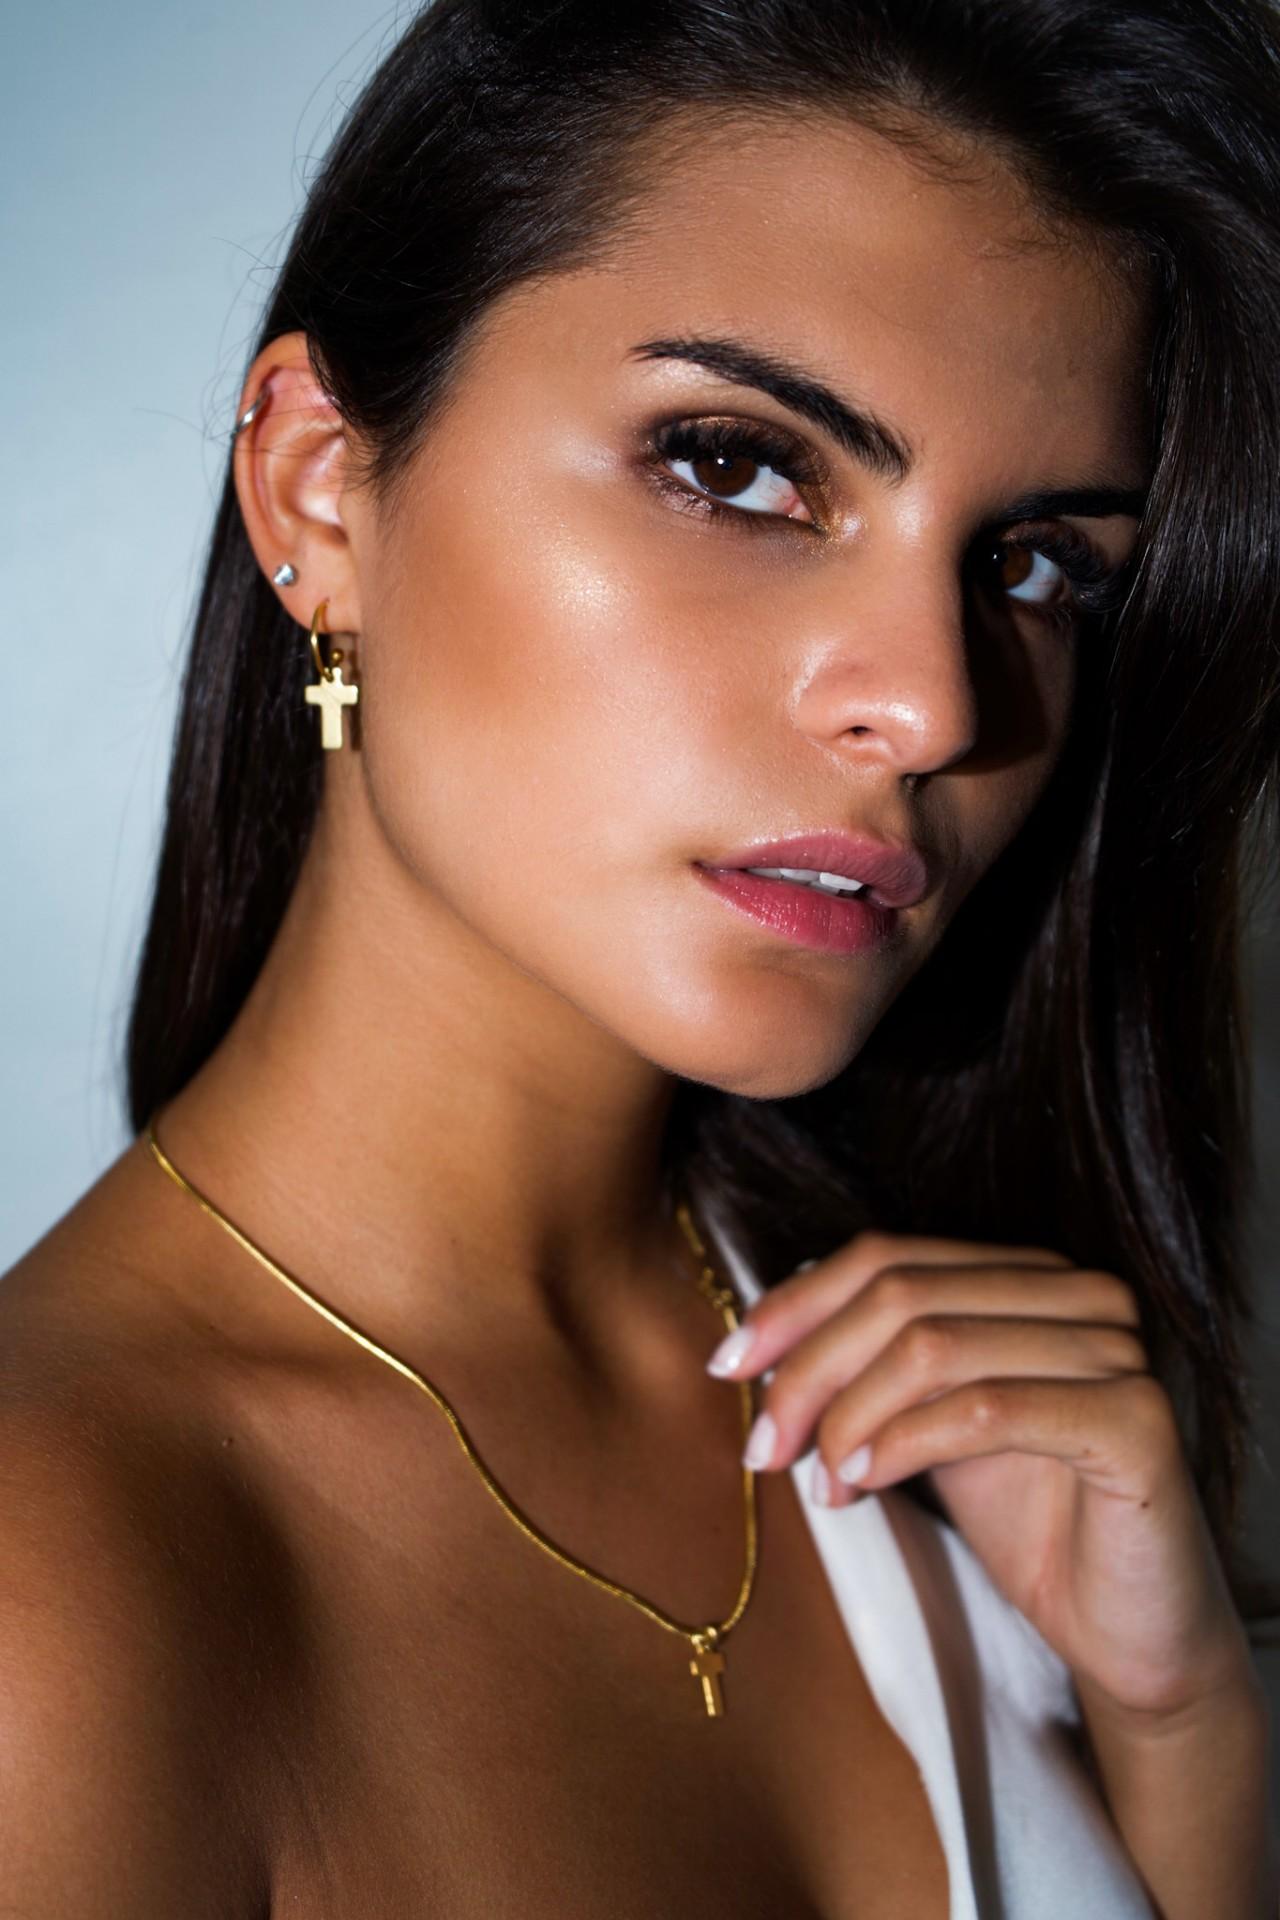 Merulana Earrings - ACTO DESIGN